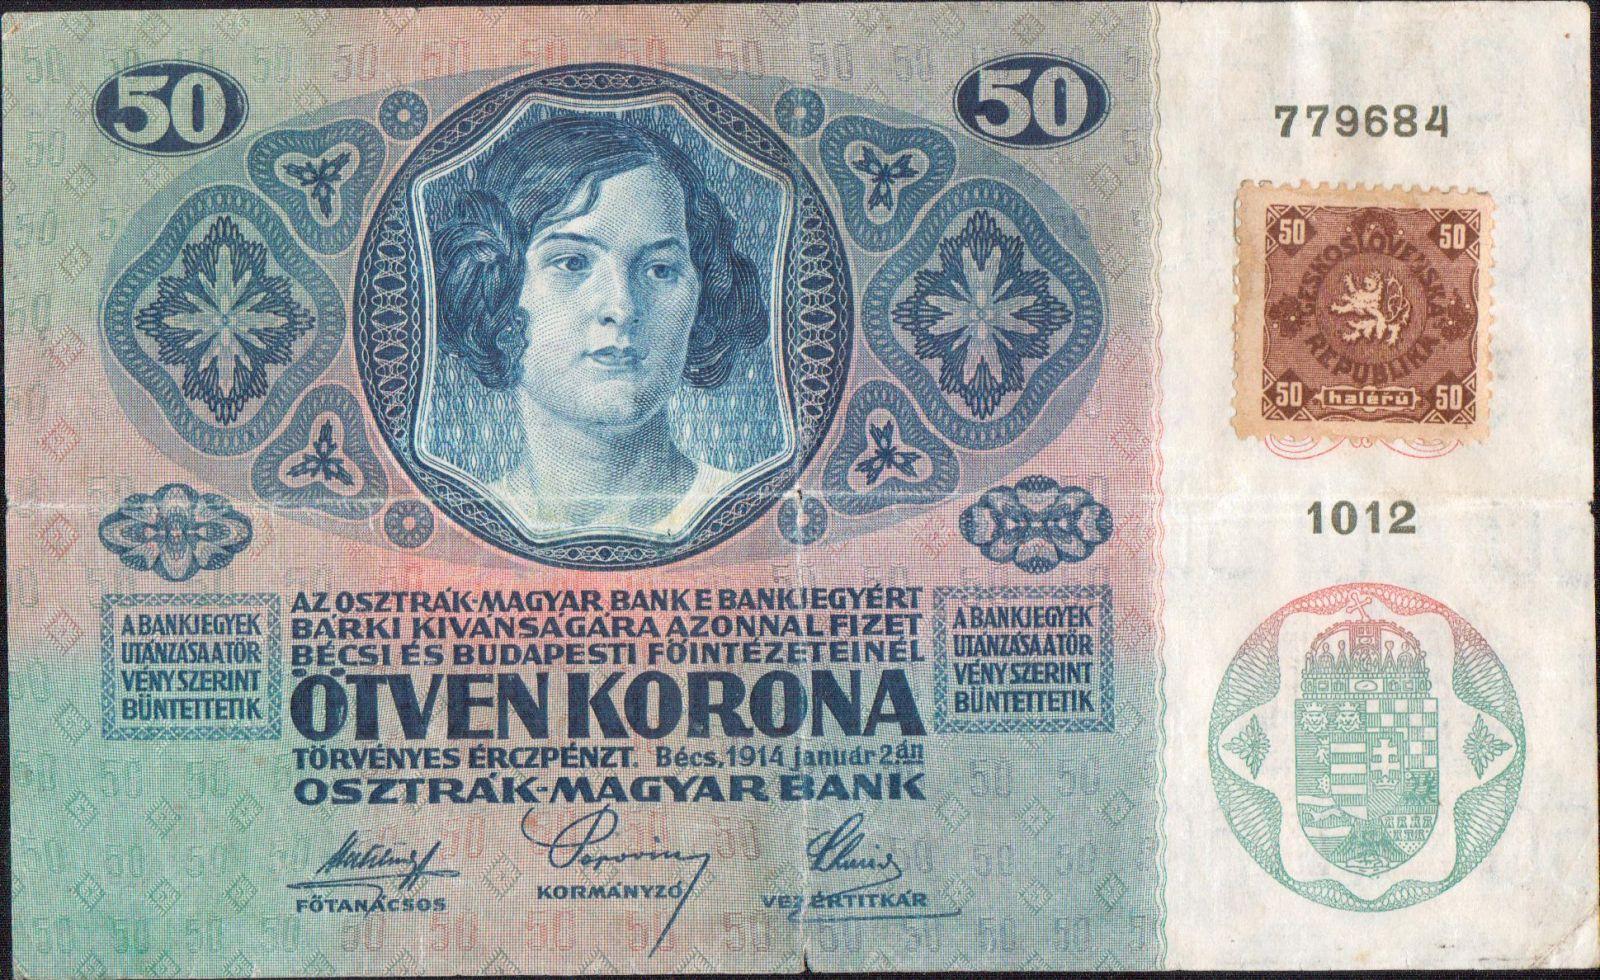 50Kč/1914-18, kolek ČSR/, stav 4, série 1012